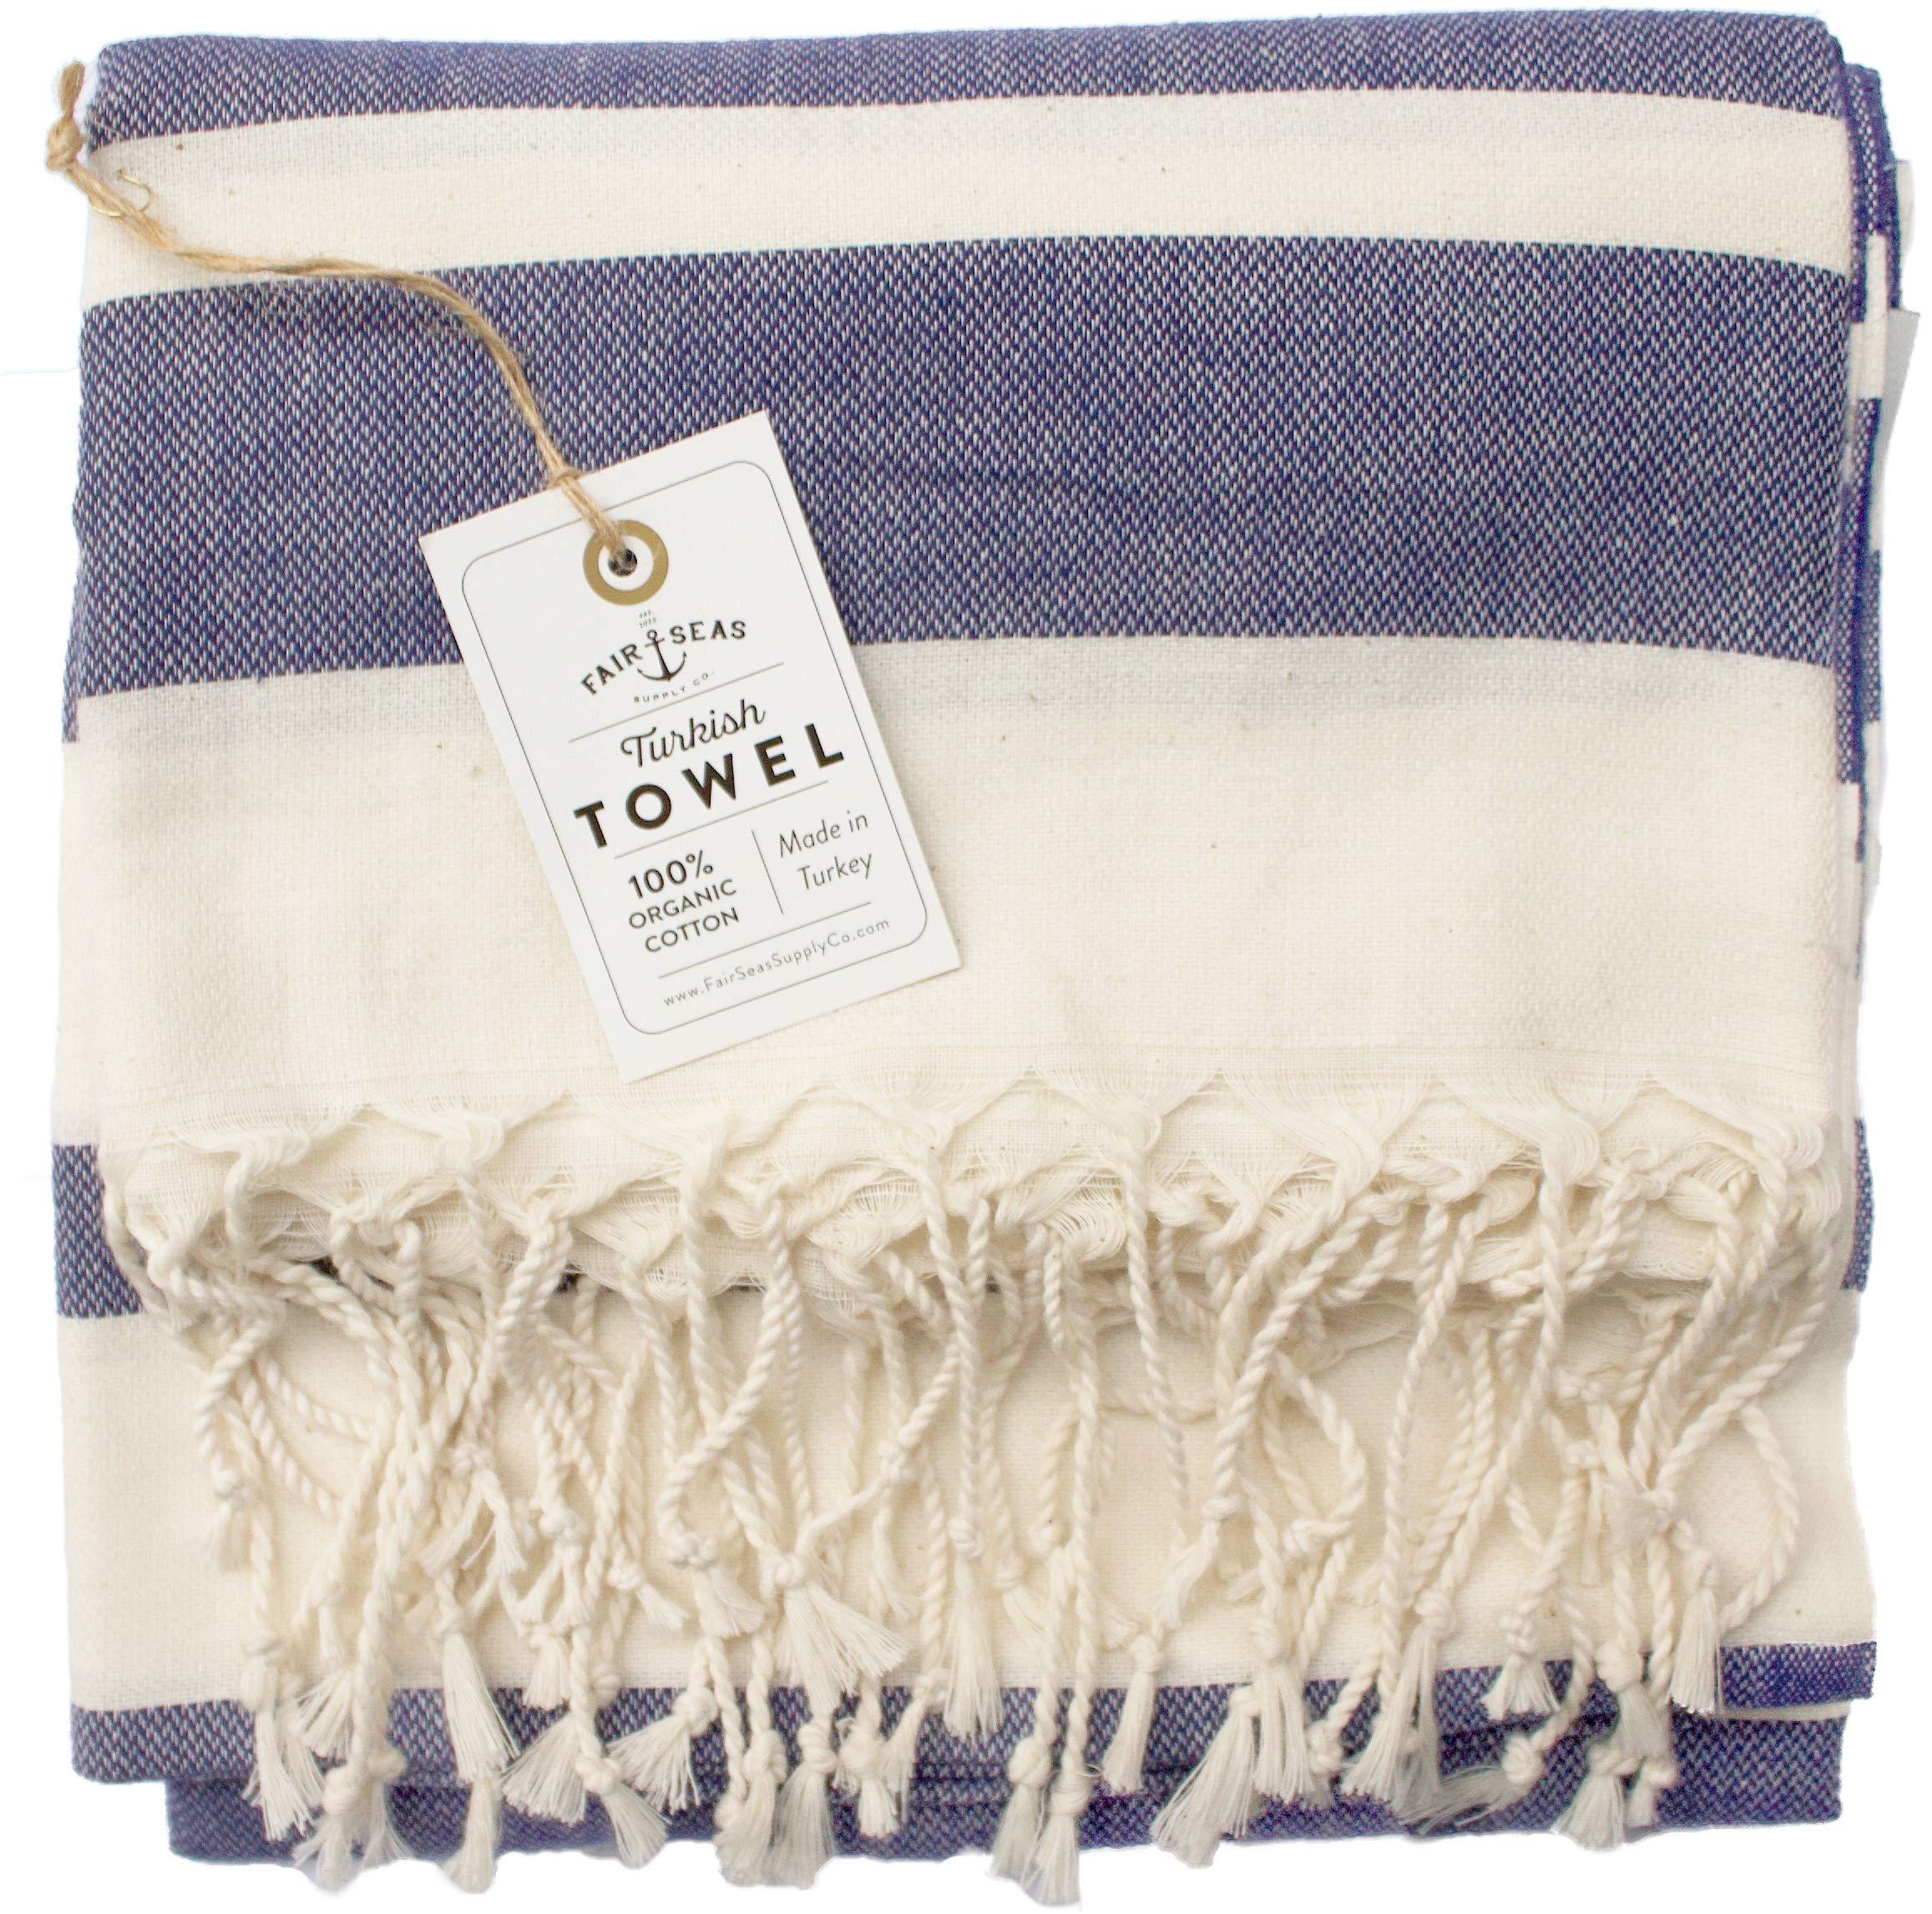 Fair Seas Supply Co. Turkish Towel, Peshtemal Towel - 100% Organic Turkish Cotton - Quick Dry and Lightweight, 39'' x 71'' Large (Indigo Blue)